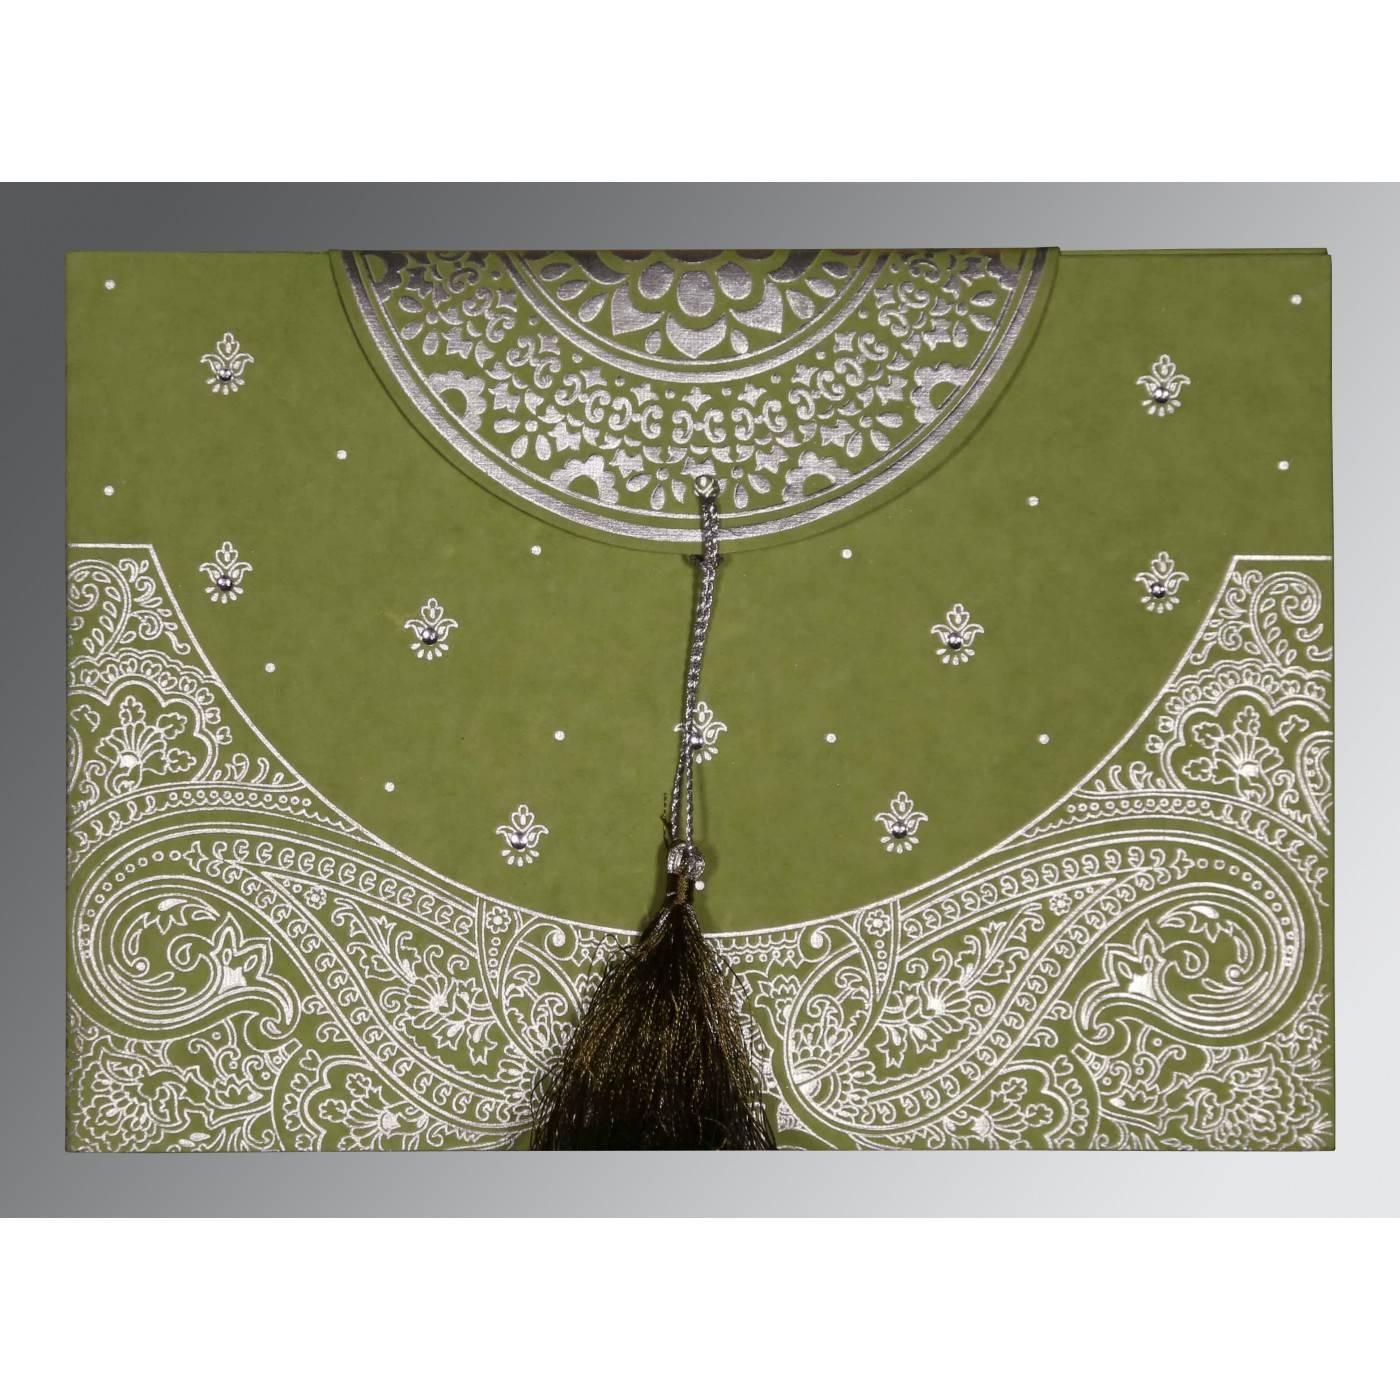 DARK OLIVE GREEN HANDMADE COTTON EMBOSSED WEDDING CARD : CG-8234C - IndianWeddingCards